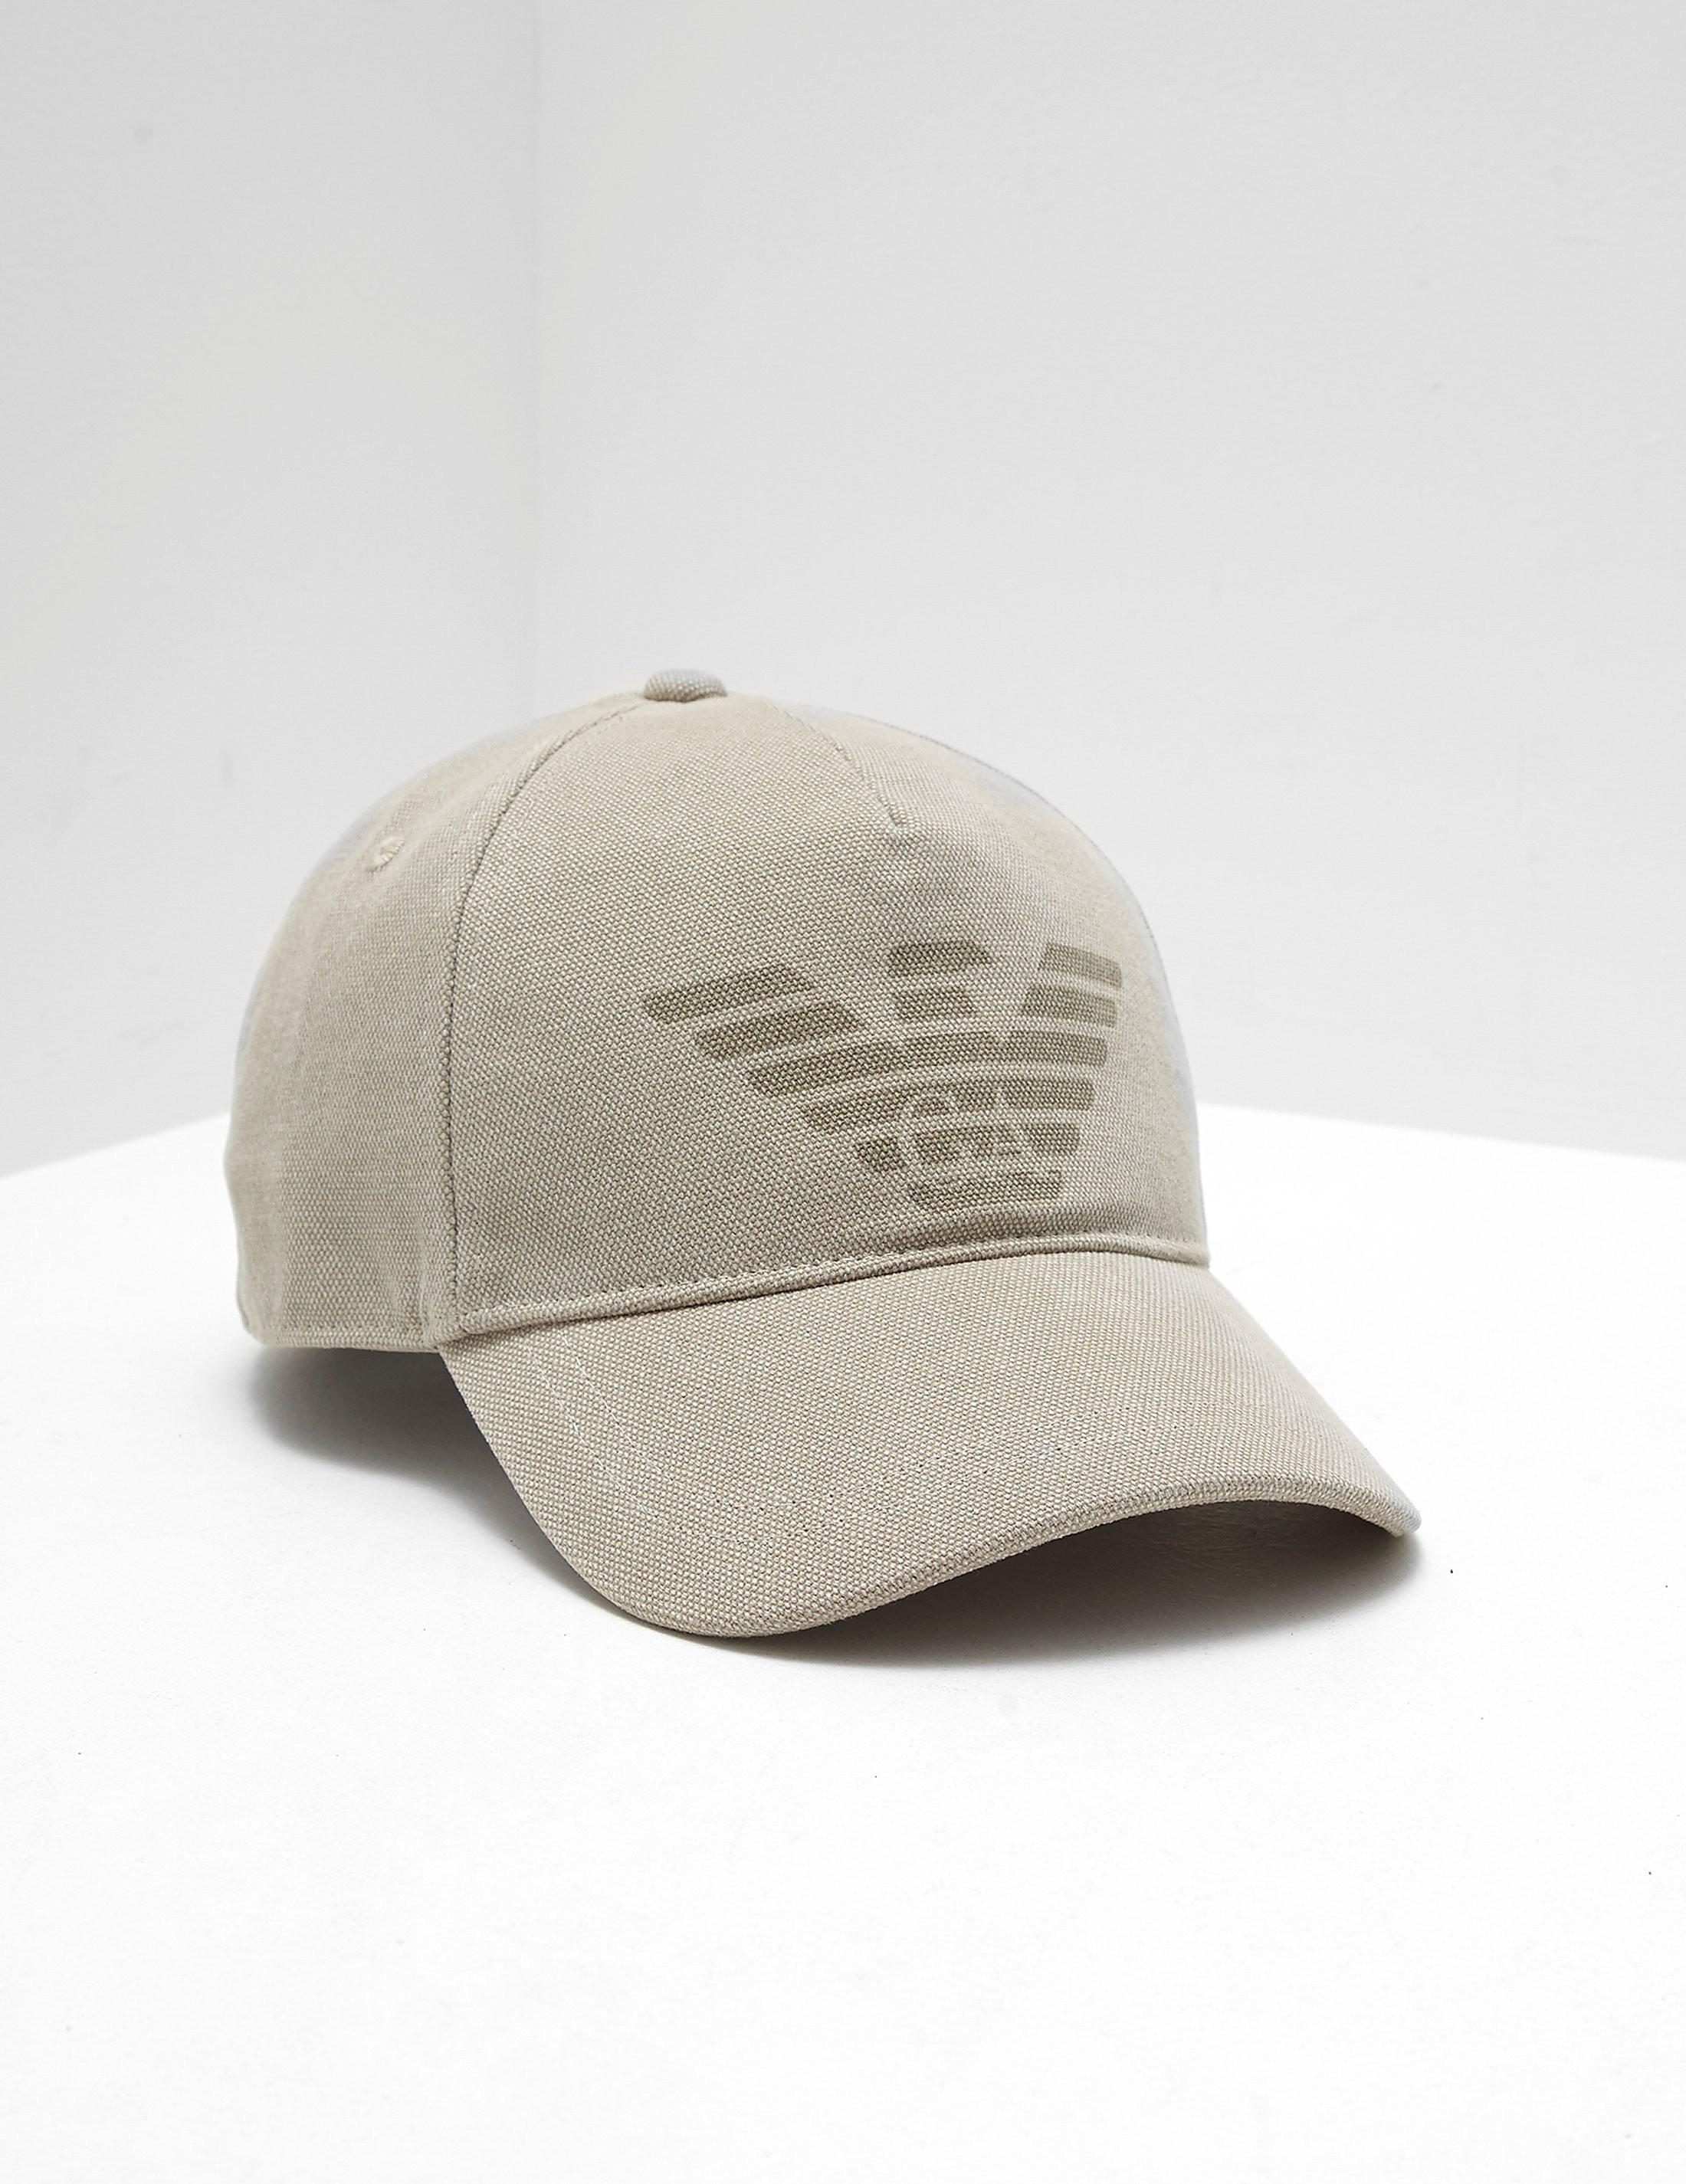 84e55725b5c Mens Emporio Armani Eagle Canvas Cap Khaki